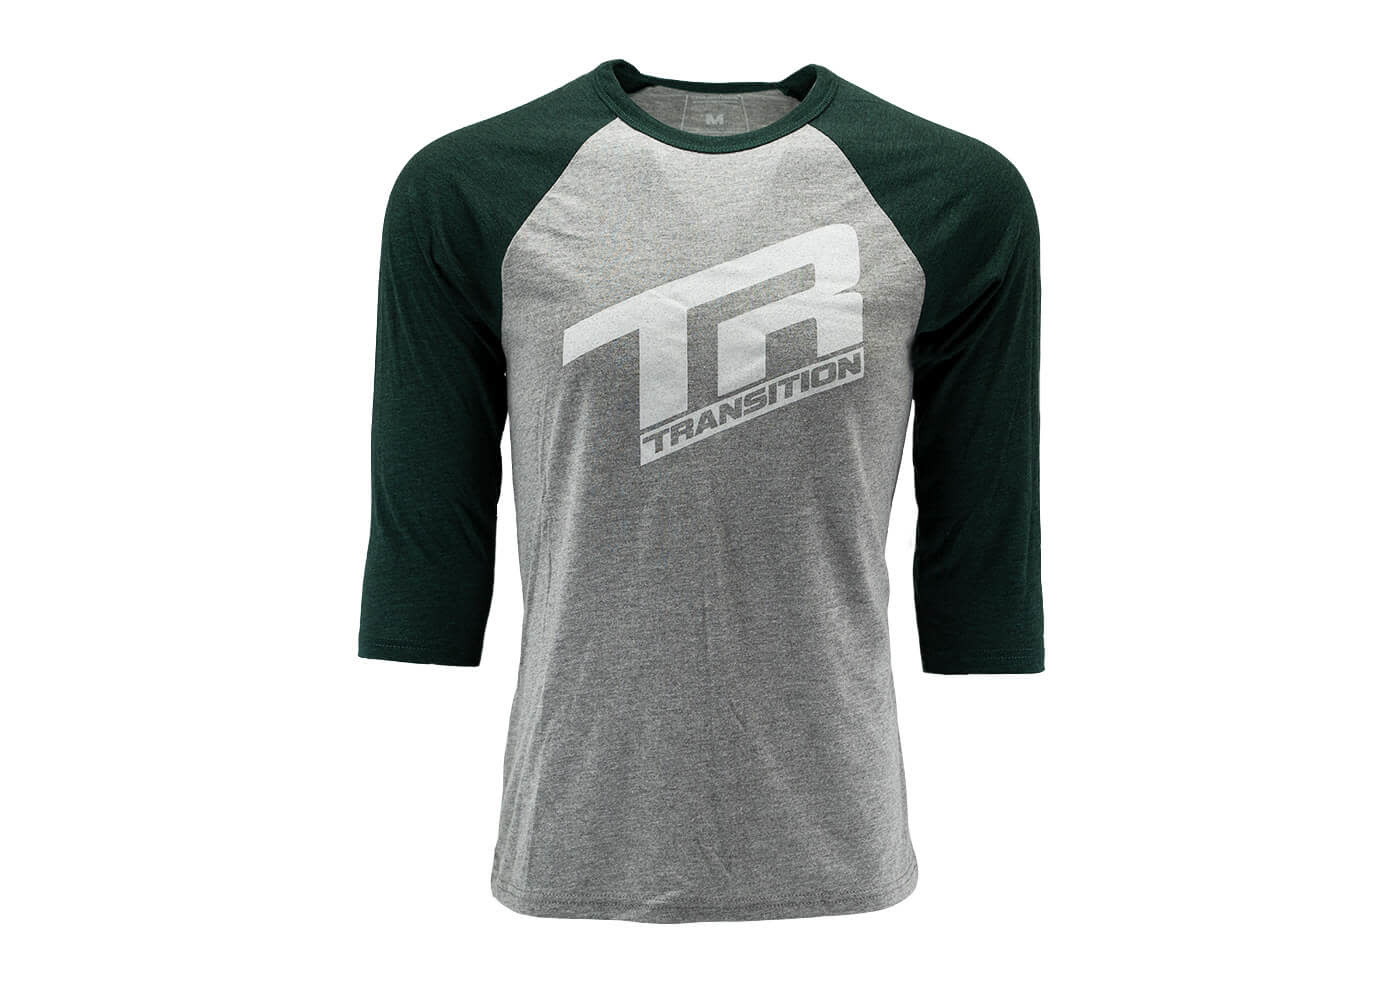 Transition TBC - 3/4 Sleeve Shirt: TR Logo (Small, Grey- Deep Sea Green)